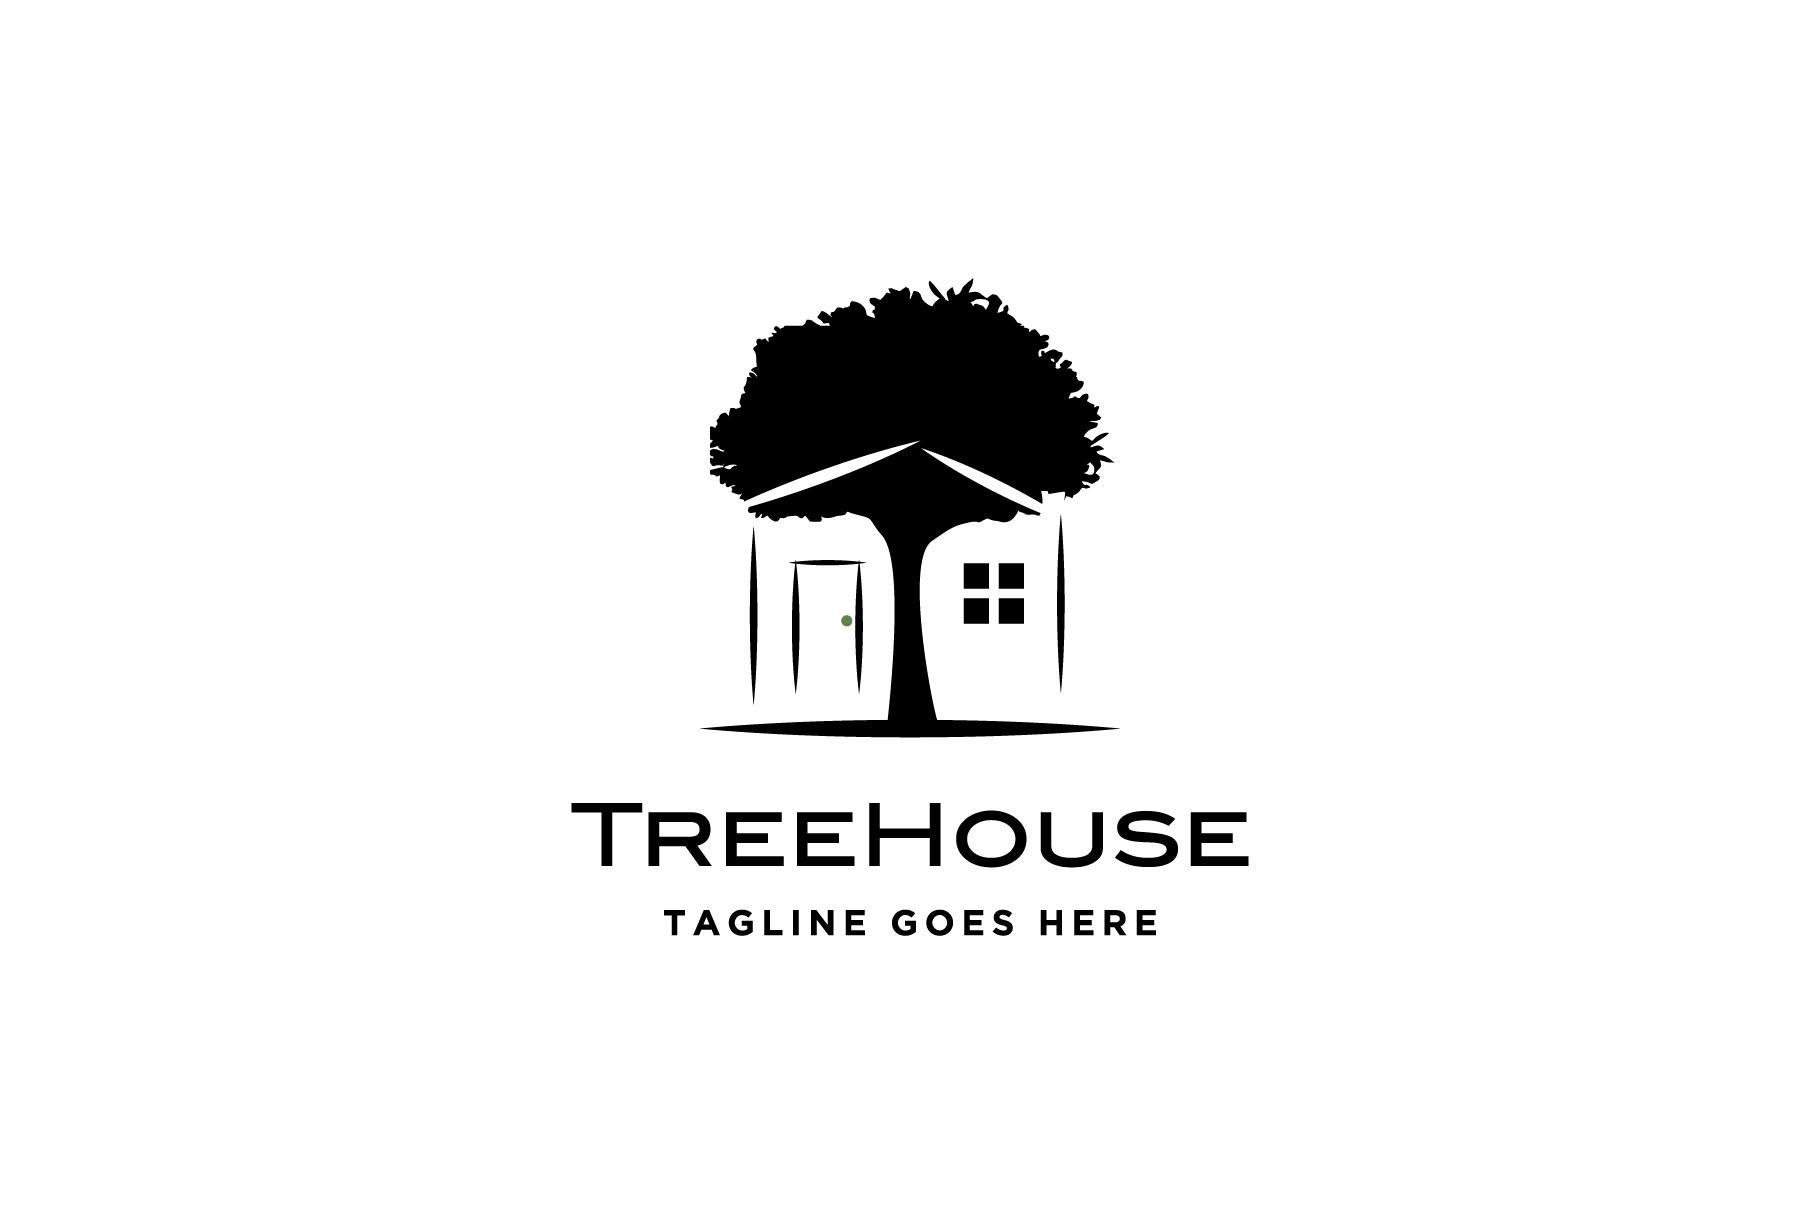 tree house logo example image 1